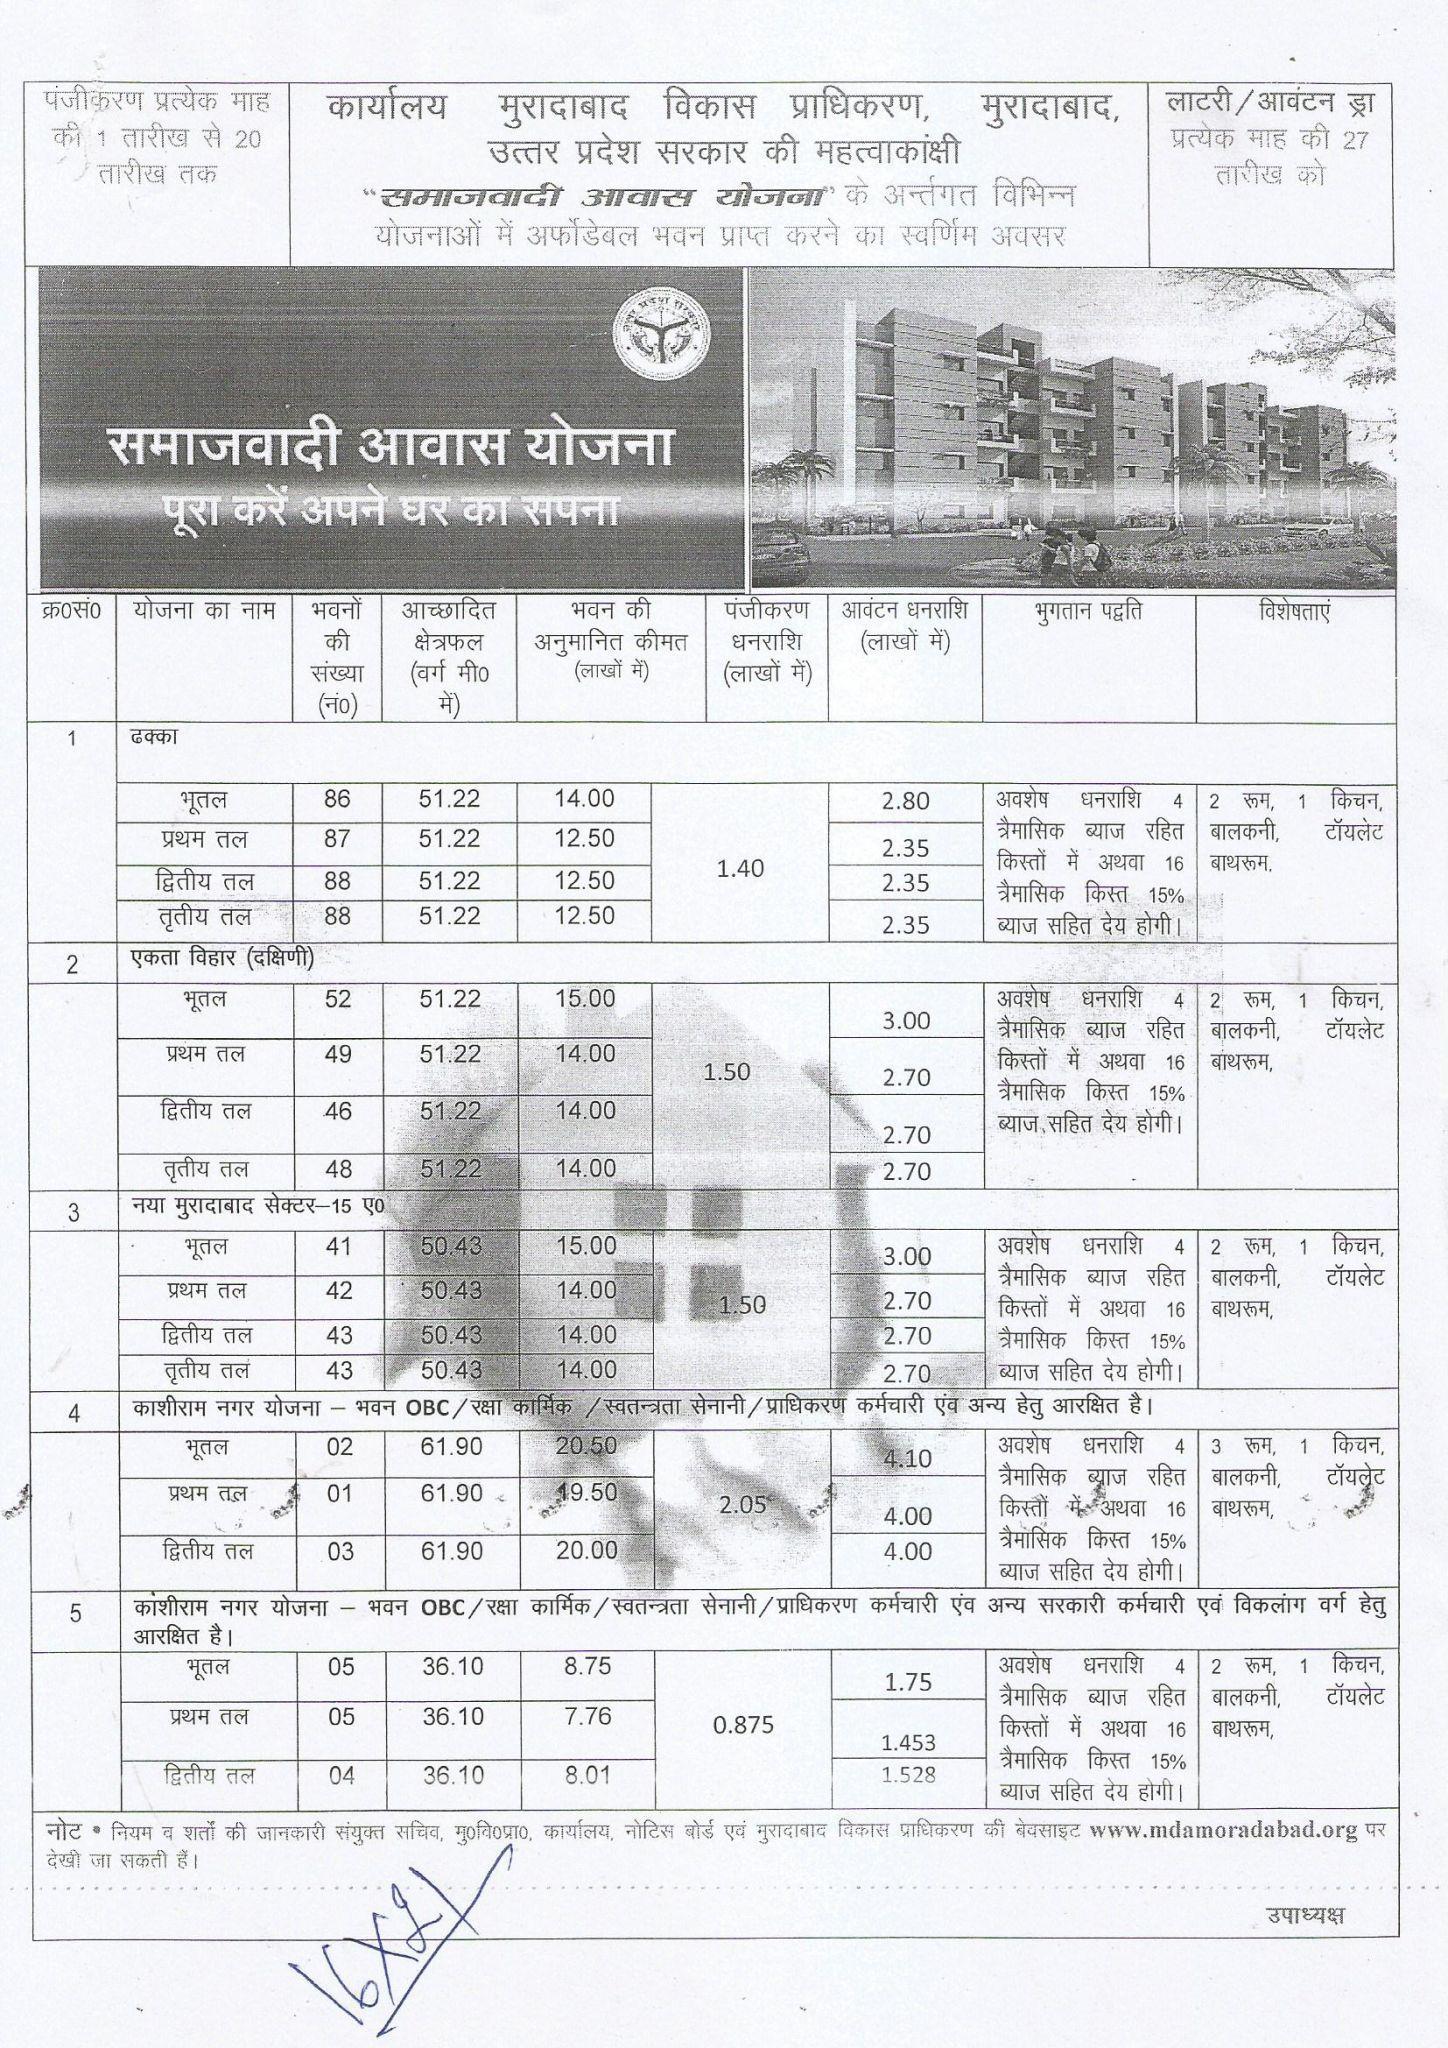 Mda moradabad new housing scheme 2016 under samajwadi awas yojana.